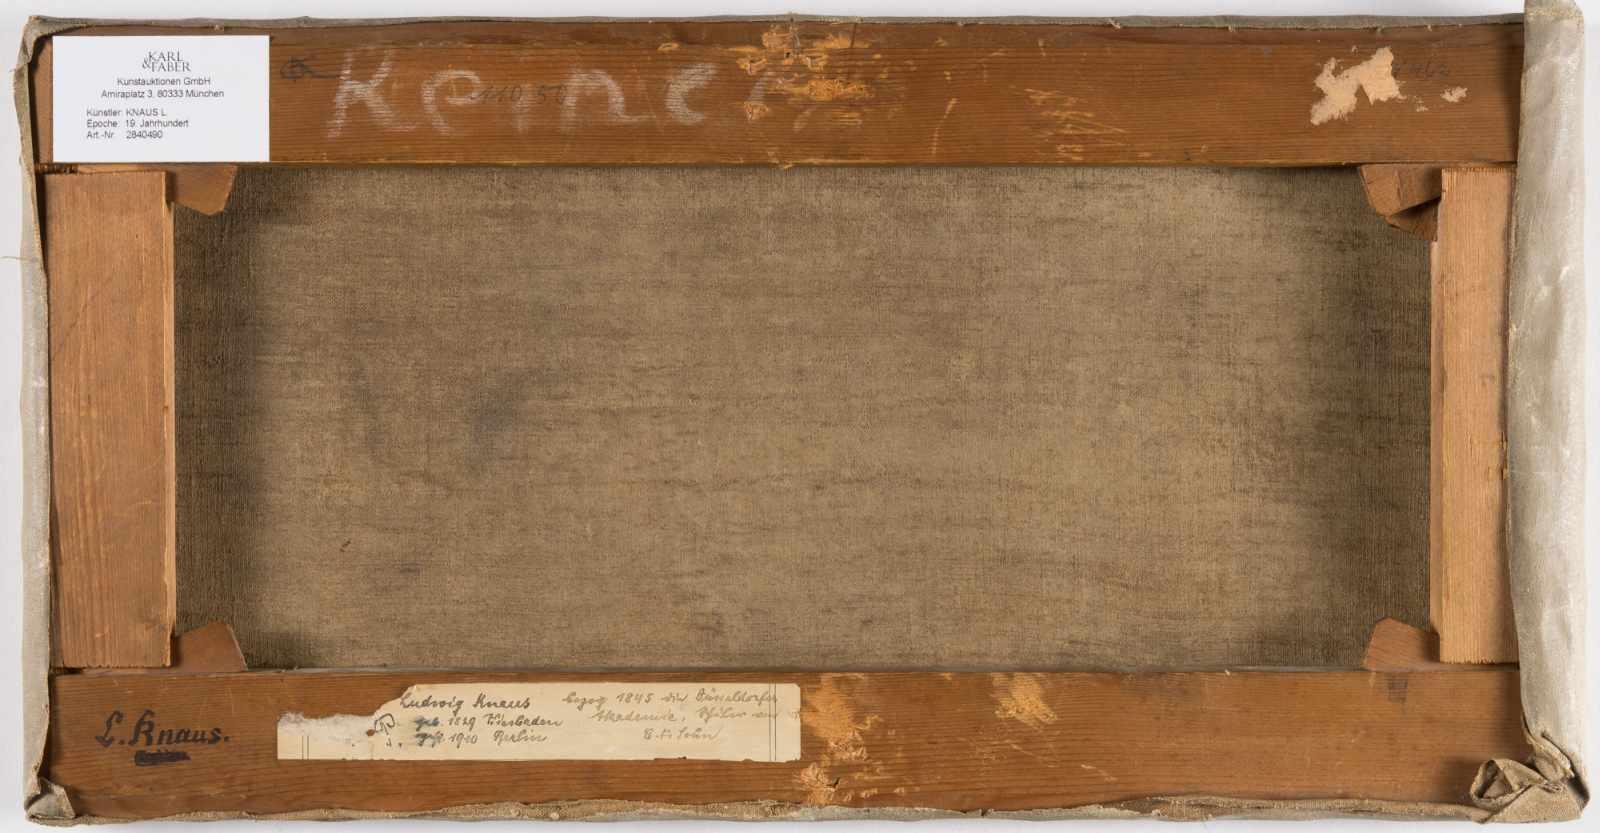 Lot 59 - Ludwig Knaus1829 Wiesbaden - Berlin 1910Spielende PuttenÖl auf Leinwand. 1855. 22,8 x 46,8 cm.